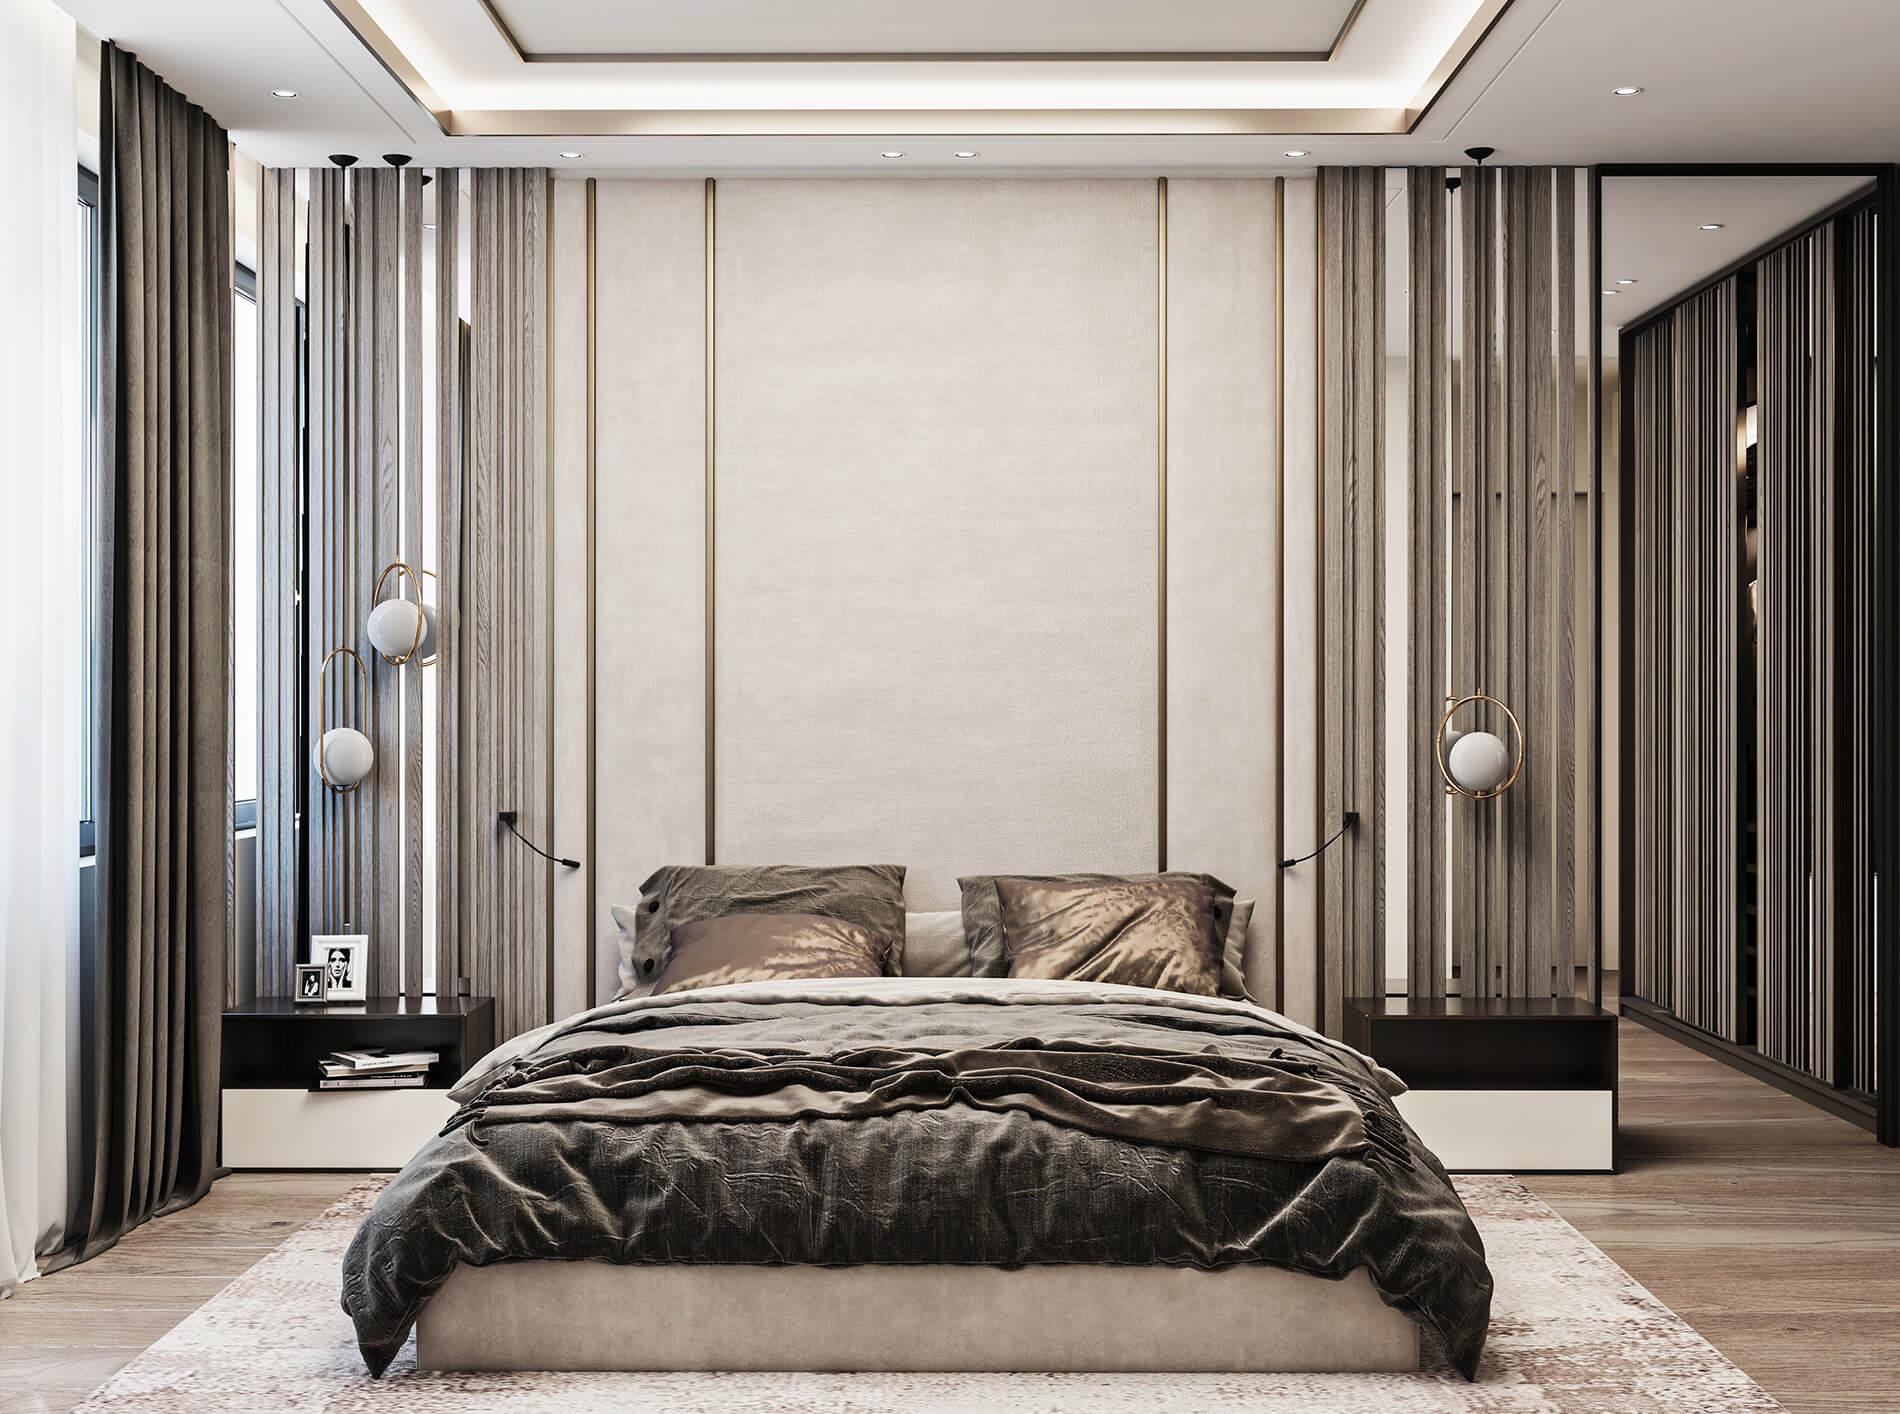 interioren dizain proekt na spalnya proekt orbis